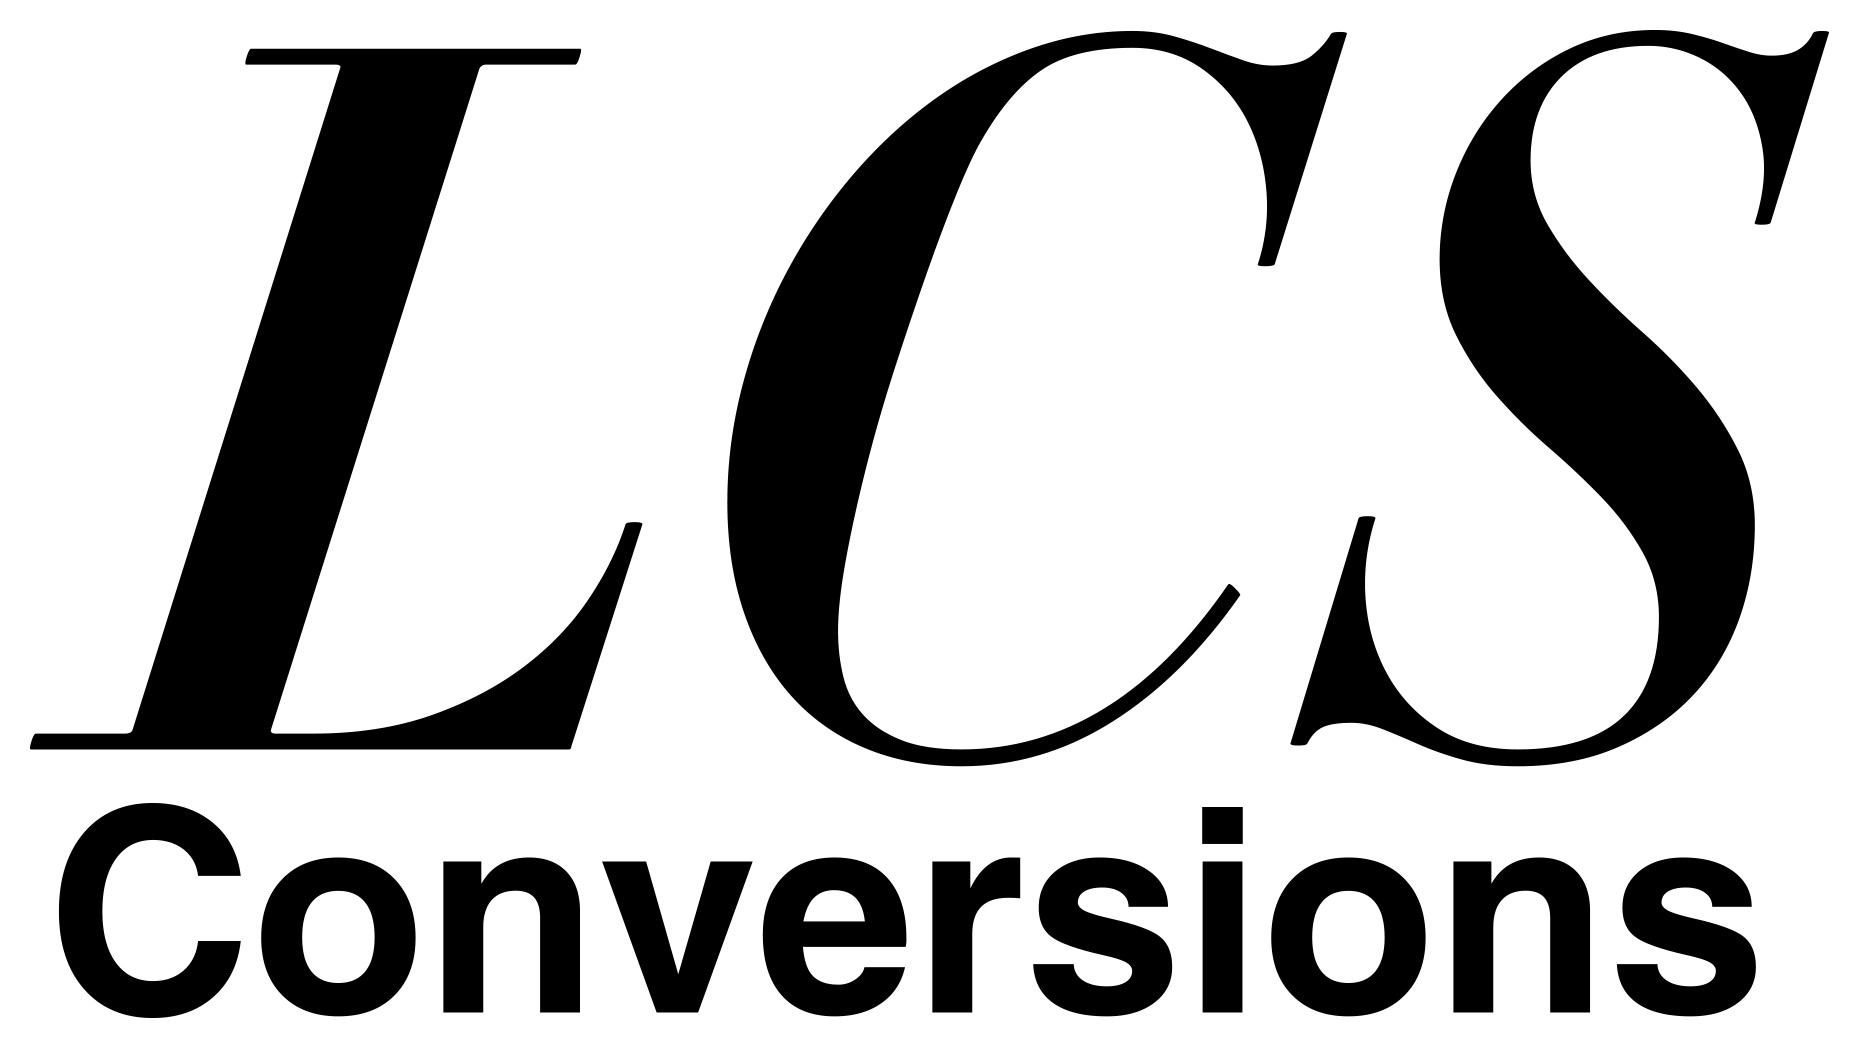 LCS Conversions